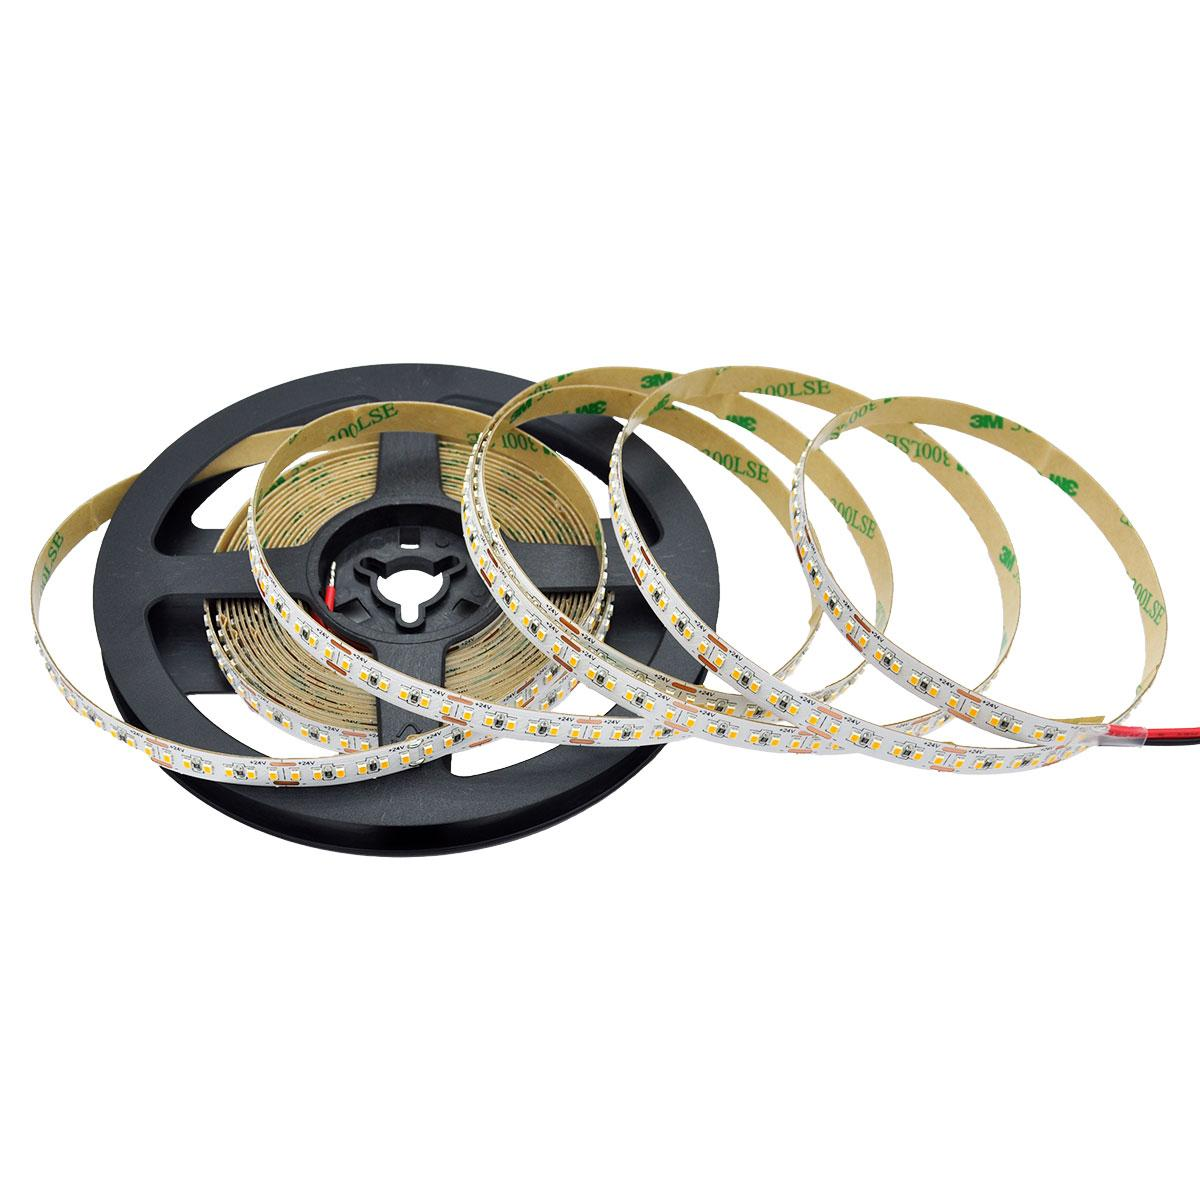 Strip Warmweiß 24V CRI90 LED Streifen 5M 12W/m 240LED/m 8mm IP65 3000K